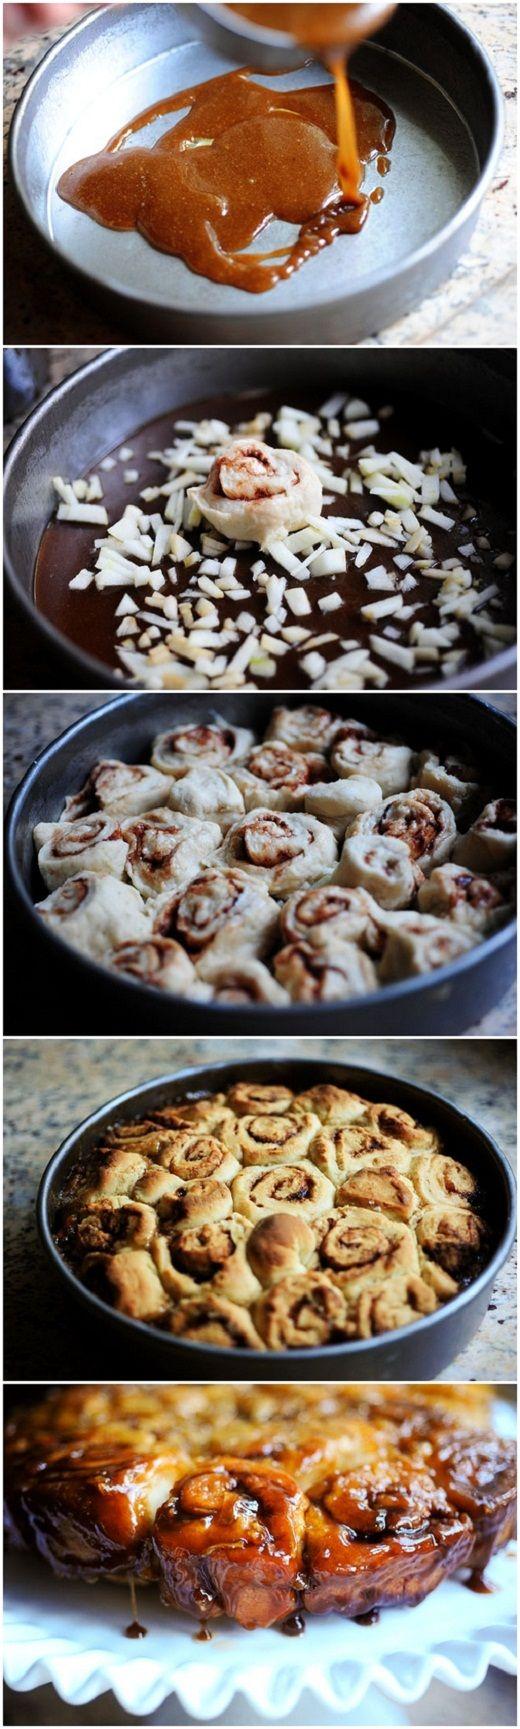 Caramel Apple Sticky Buns | Bake'n it | Pinterest